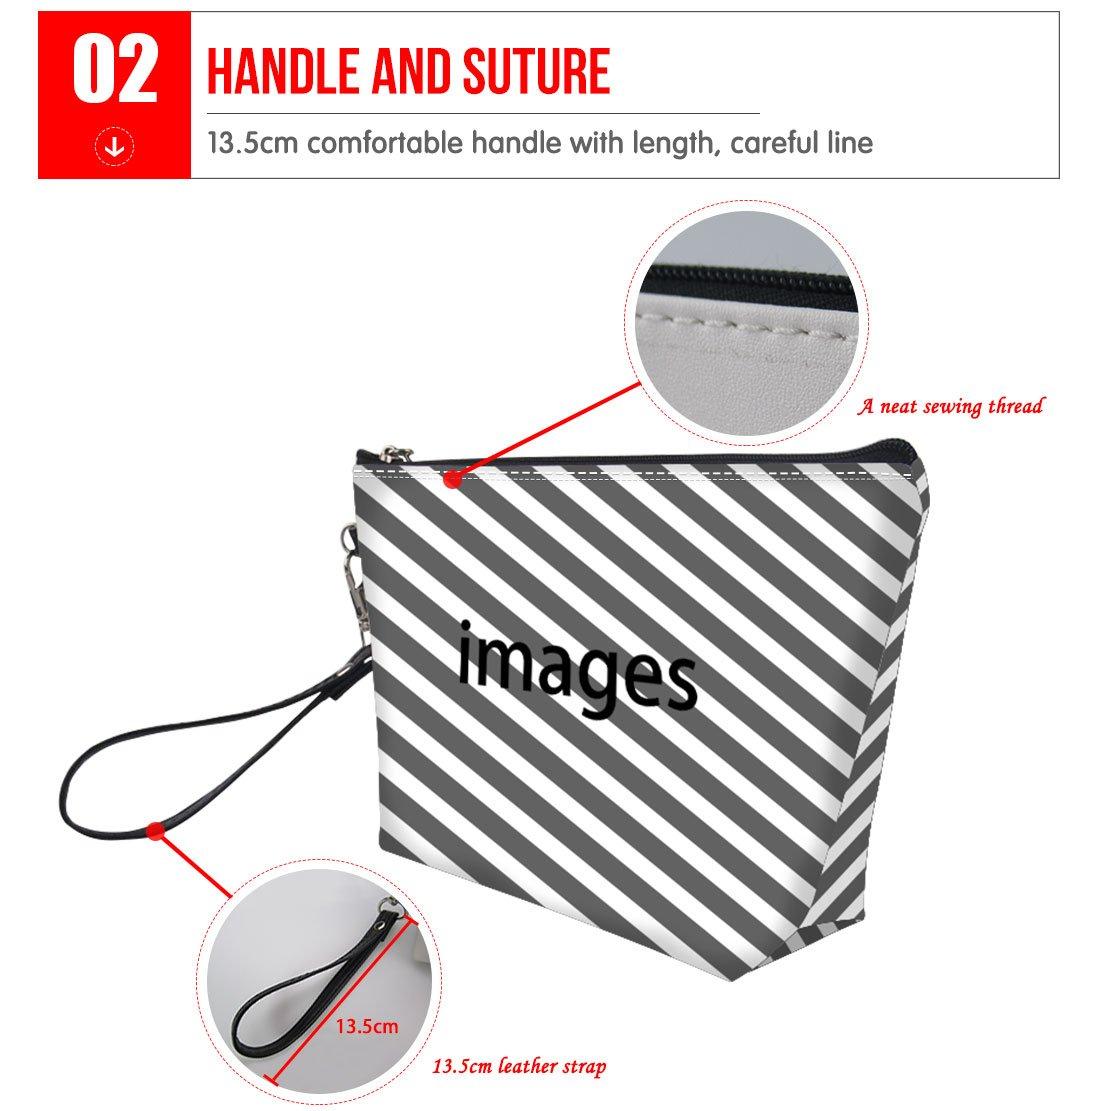 Mumeson Floral Schnauzer Pattern Trapezoid Make Up Bags Clutch Handbags by Mumeson (Image #3)